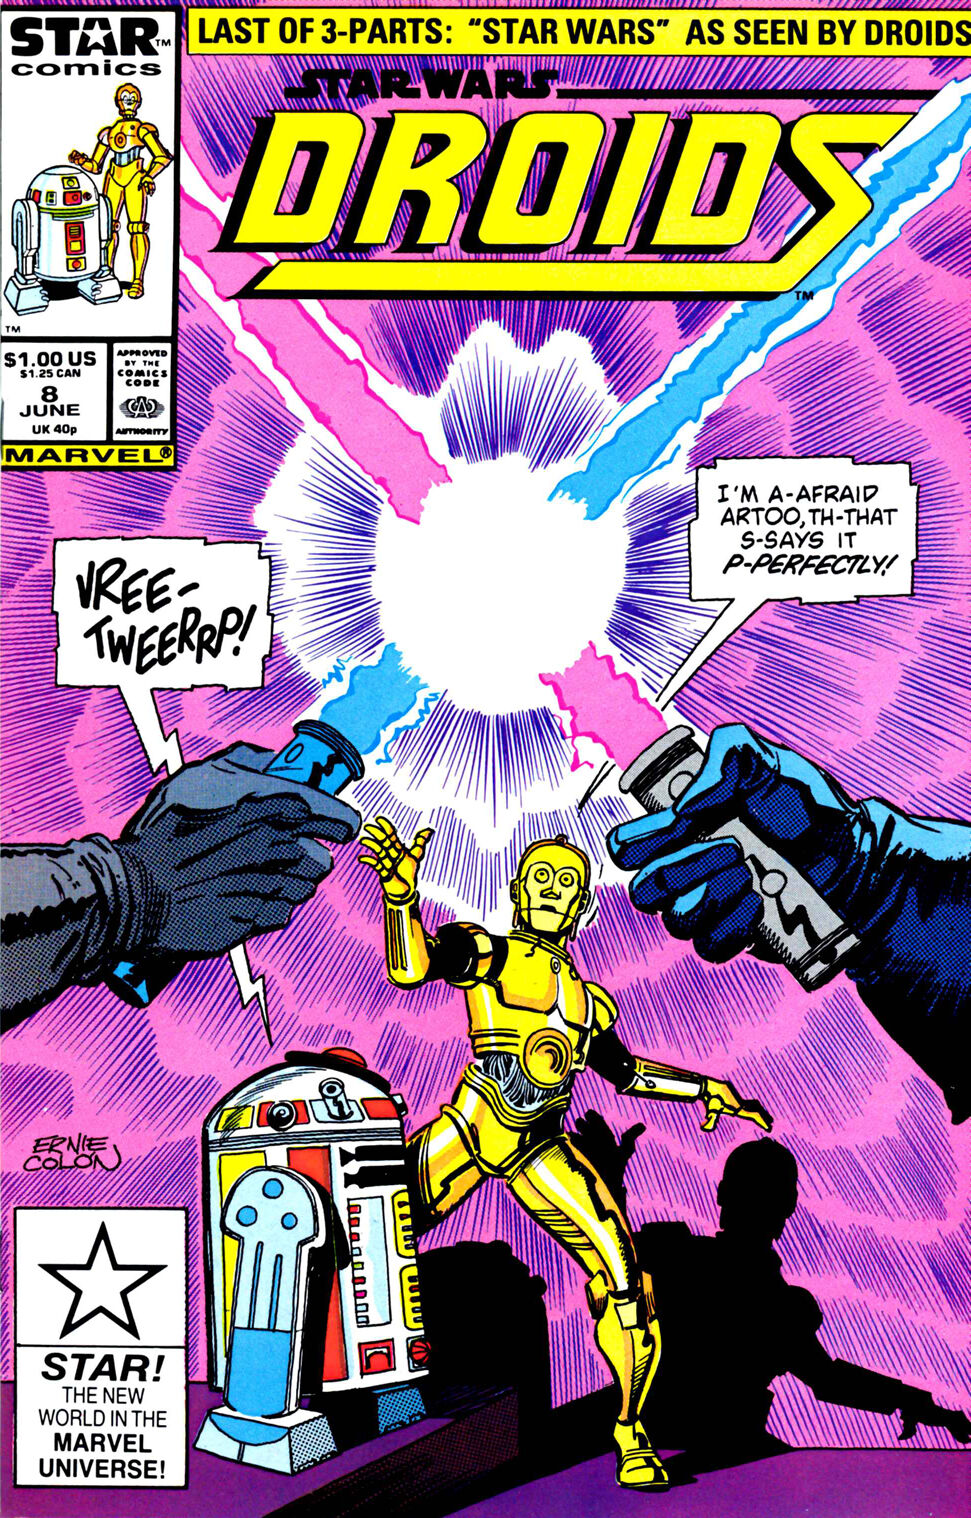 Star Wars Droids 8 (Marvel)